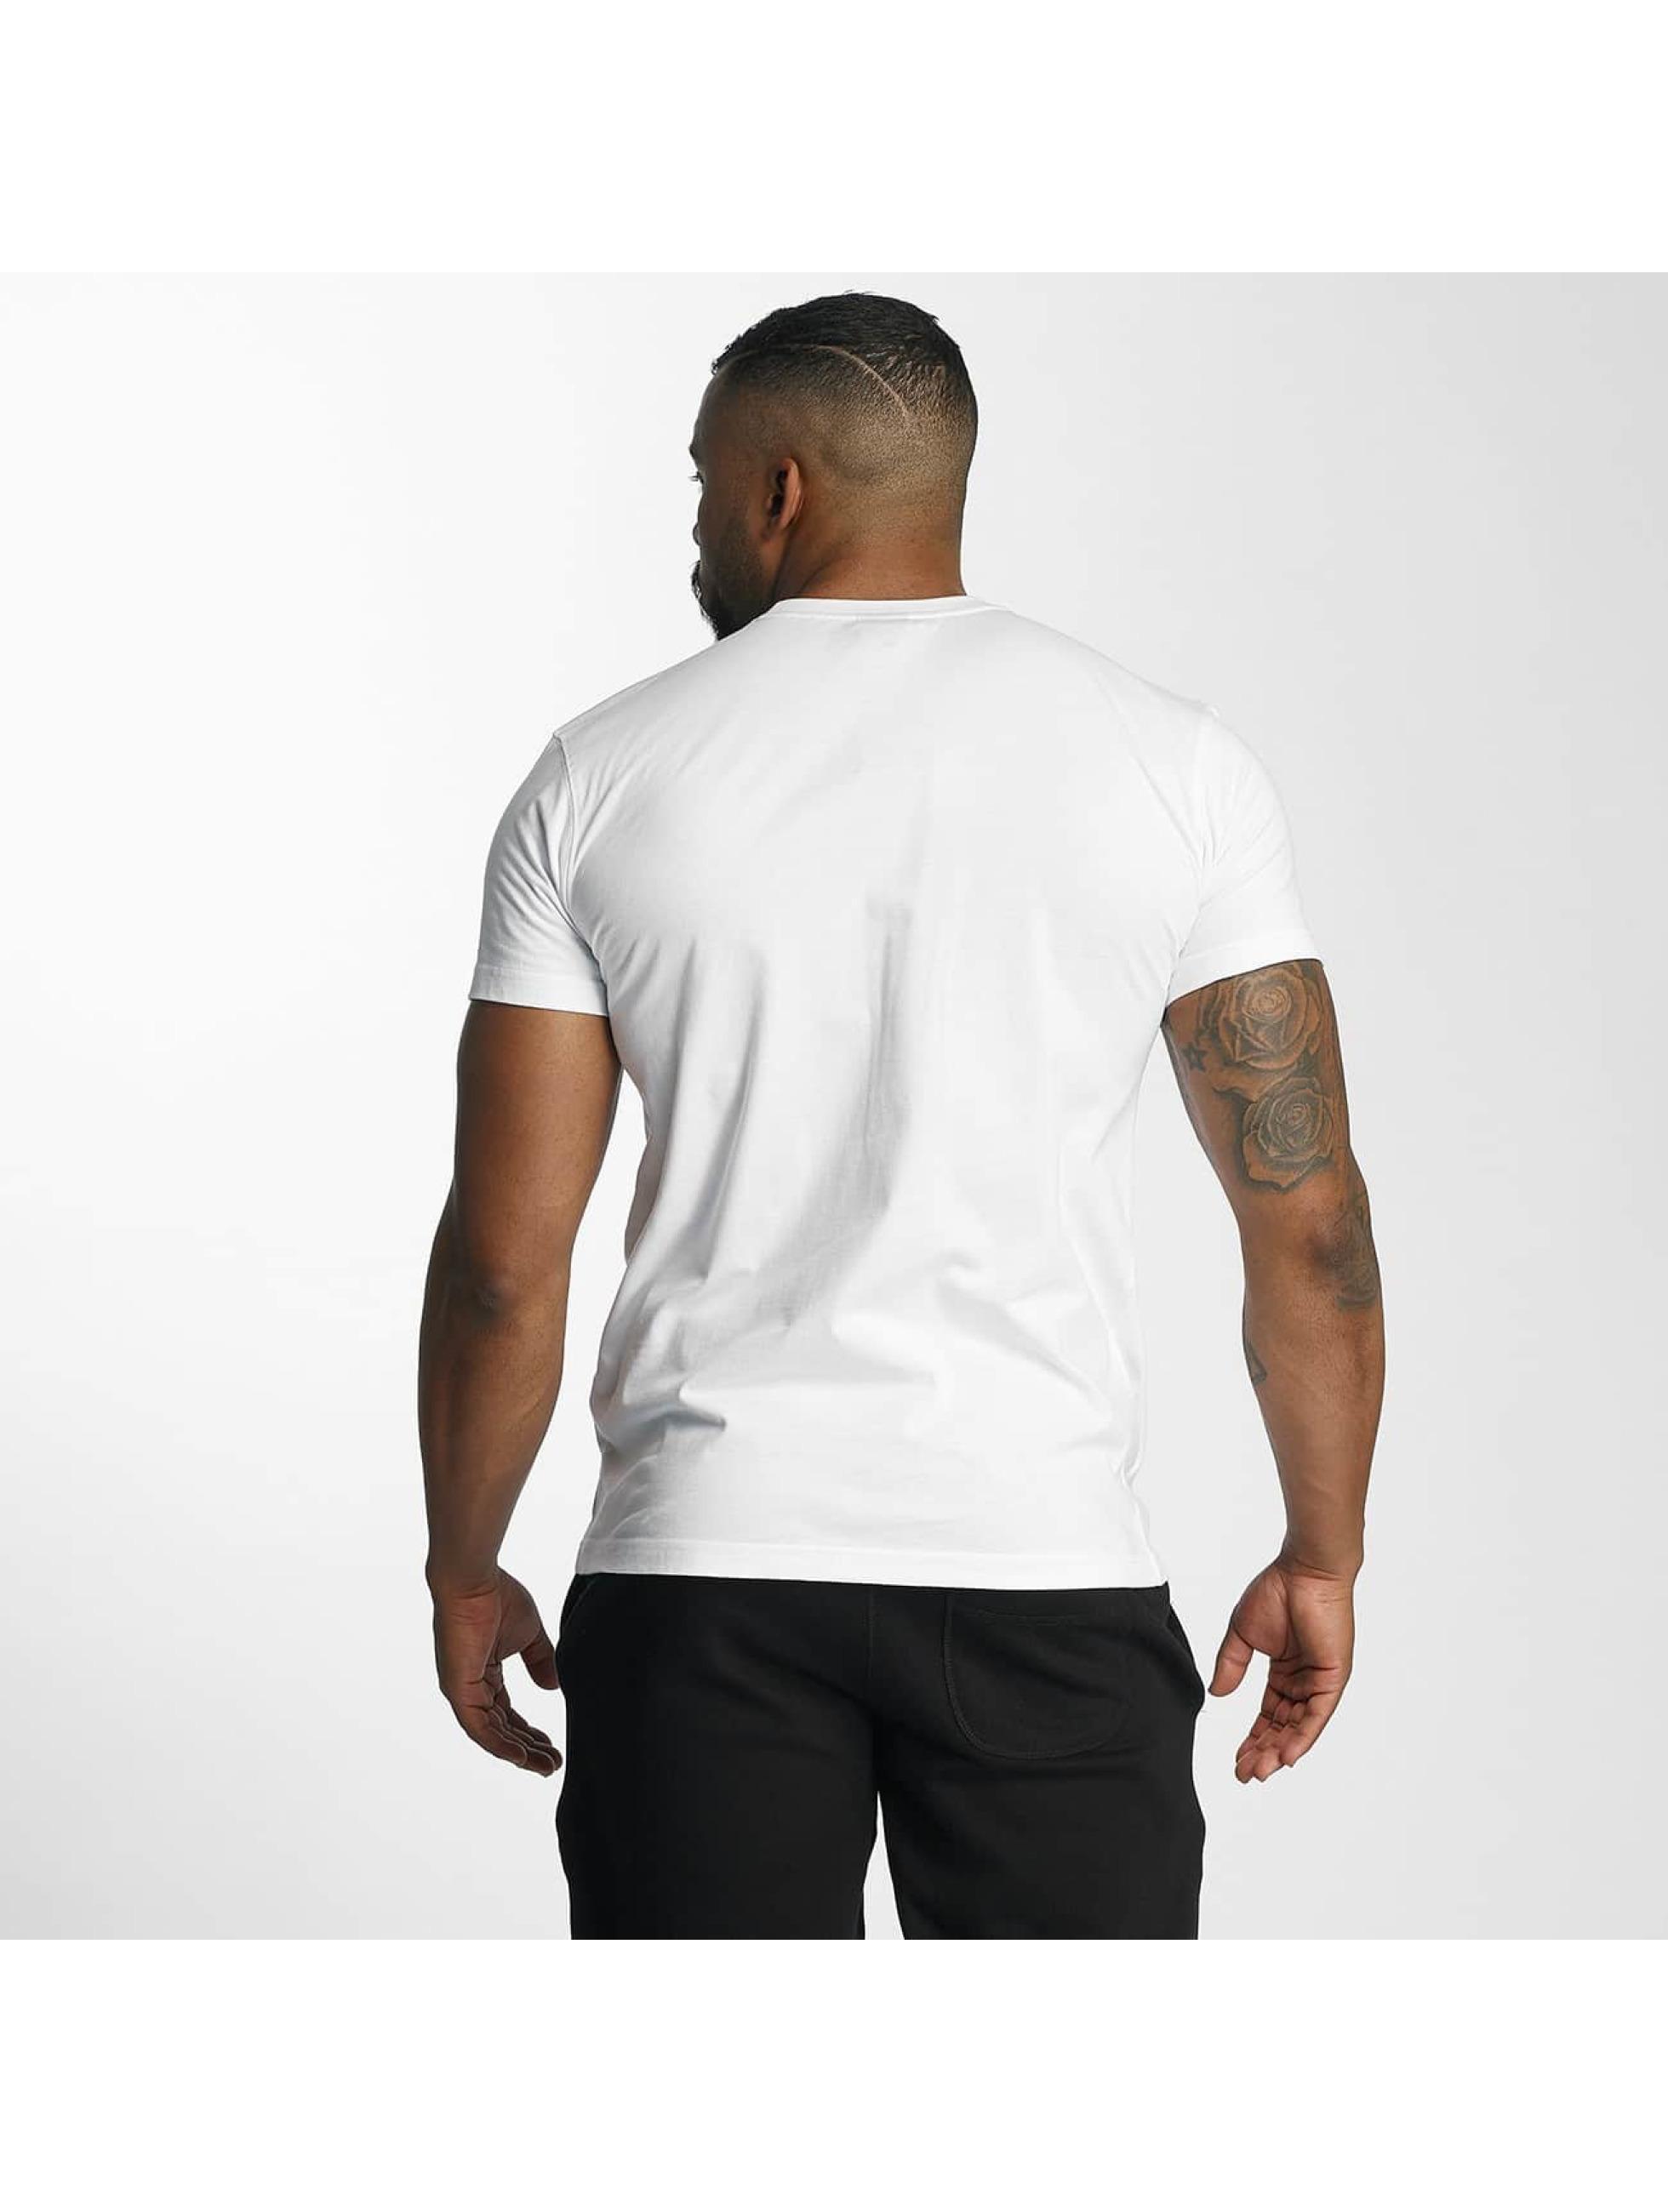 Pusher Apparel T-Shirt White Carrera weiß